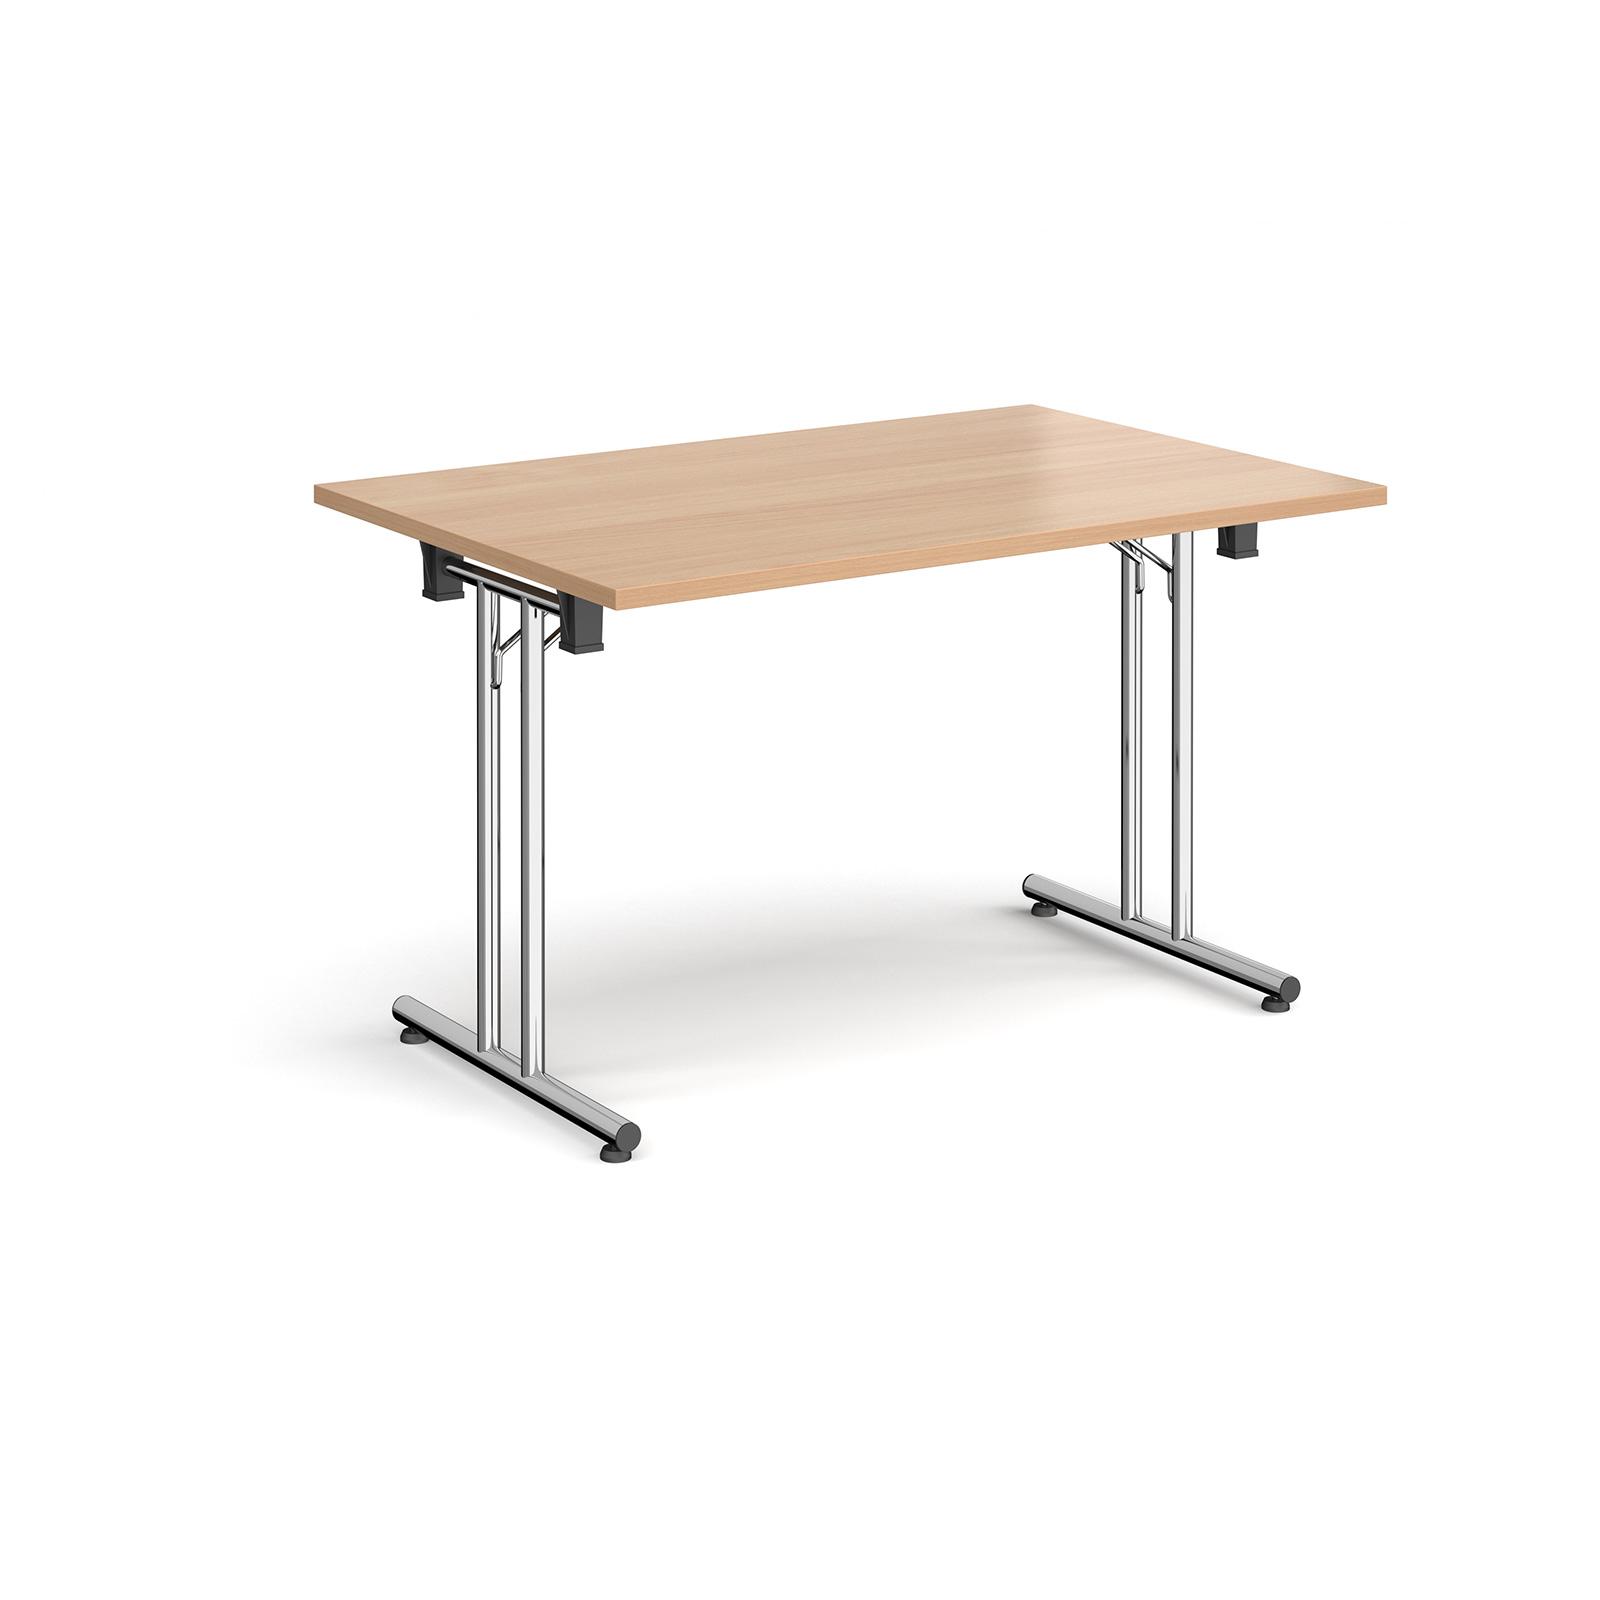 Boardroom / Meeting Rectangular folding leg table with straight feet